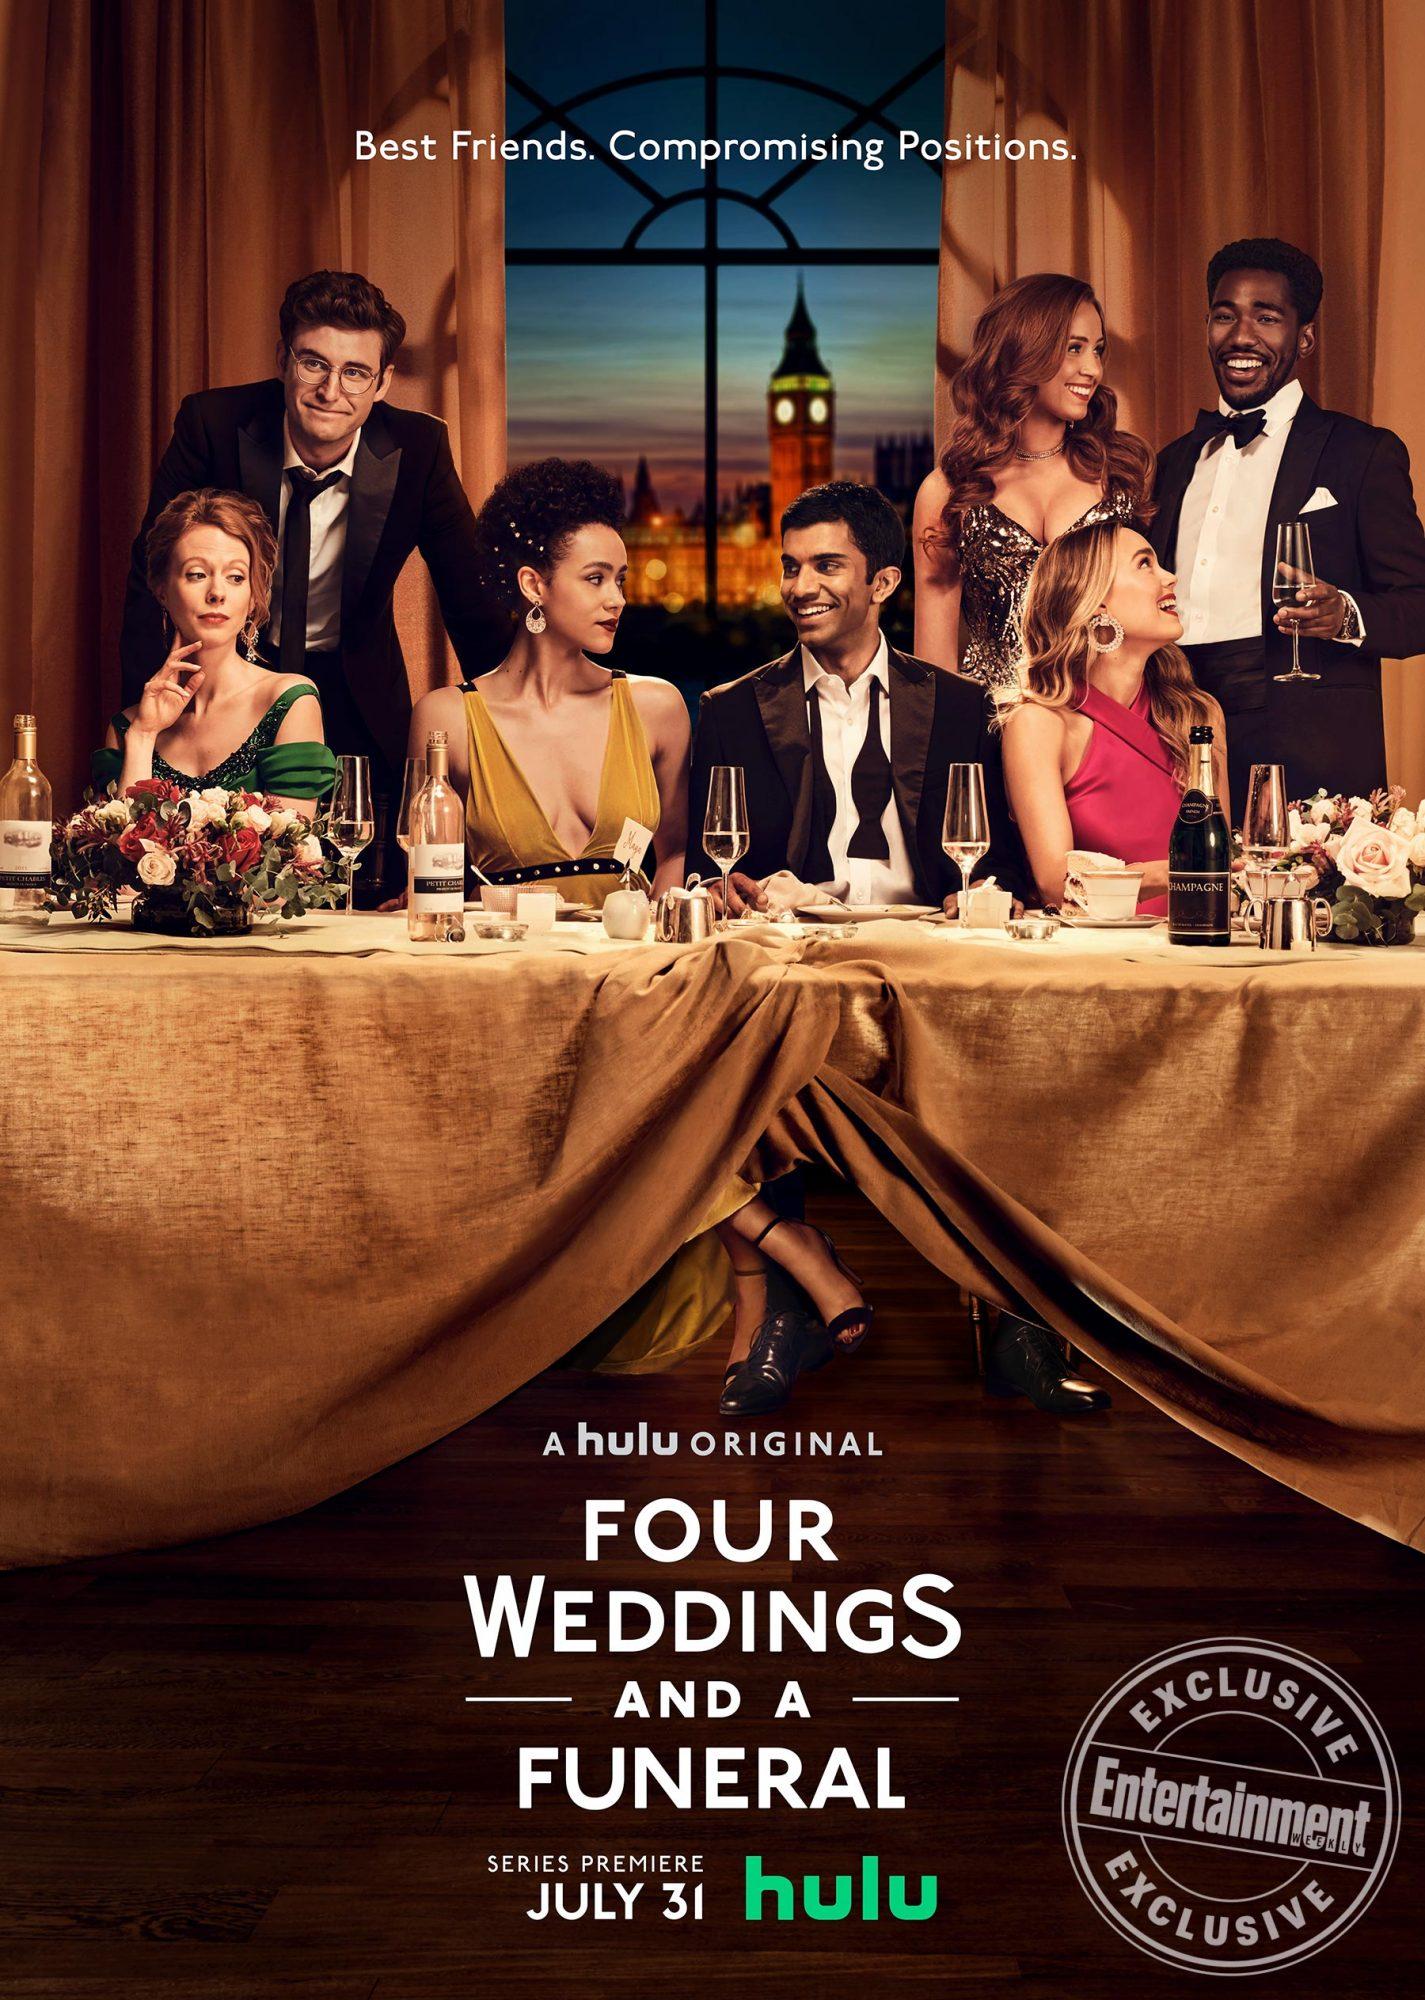 Four Weddings and a Funeral key art CR: Hulu